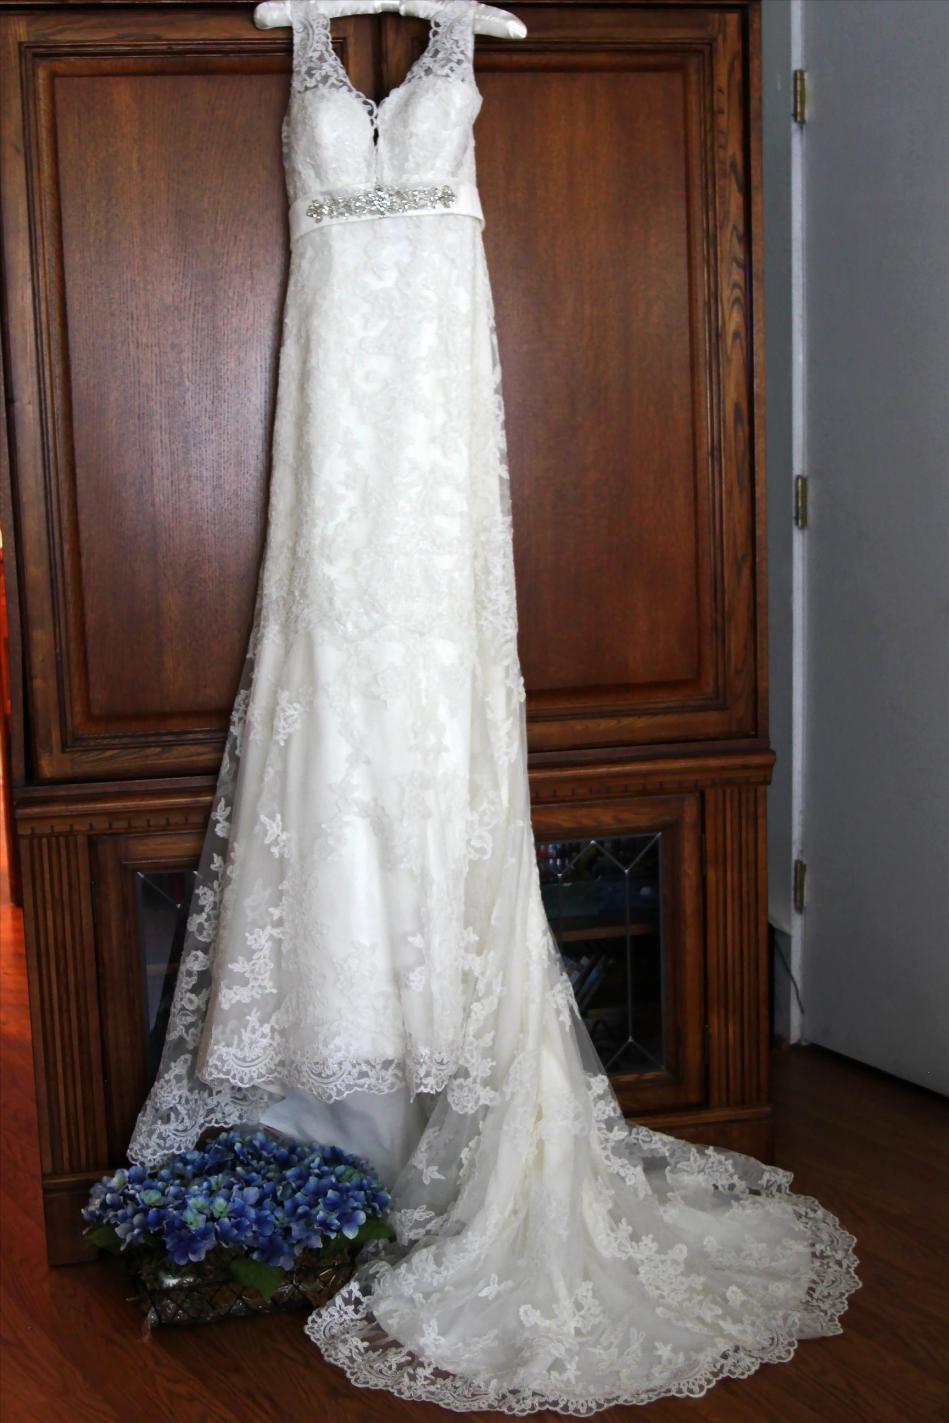 bridesdress.bridesbouquet.weddingphotos.apicturesquememoryphotography